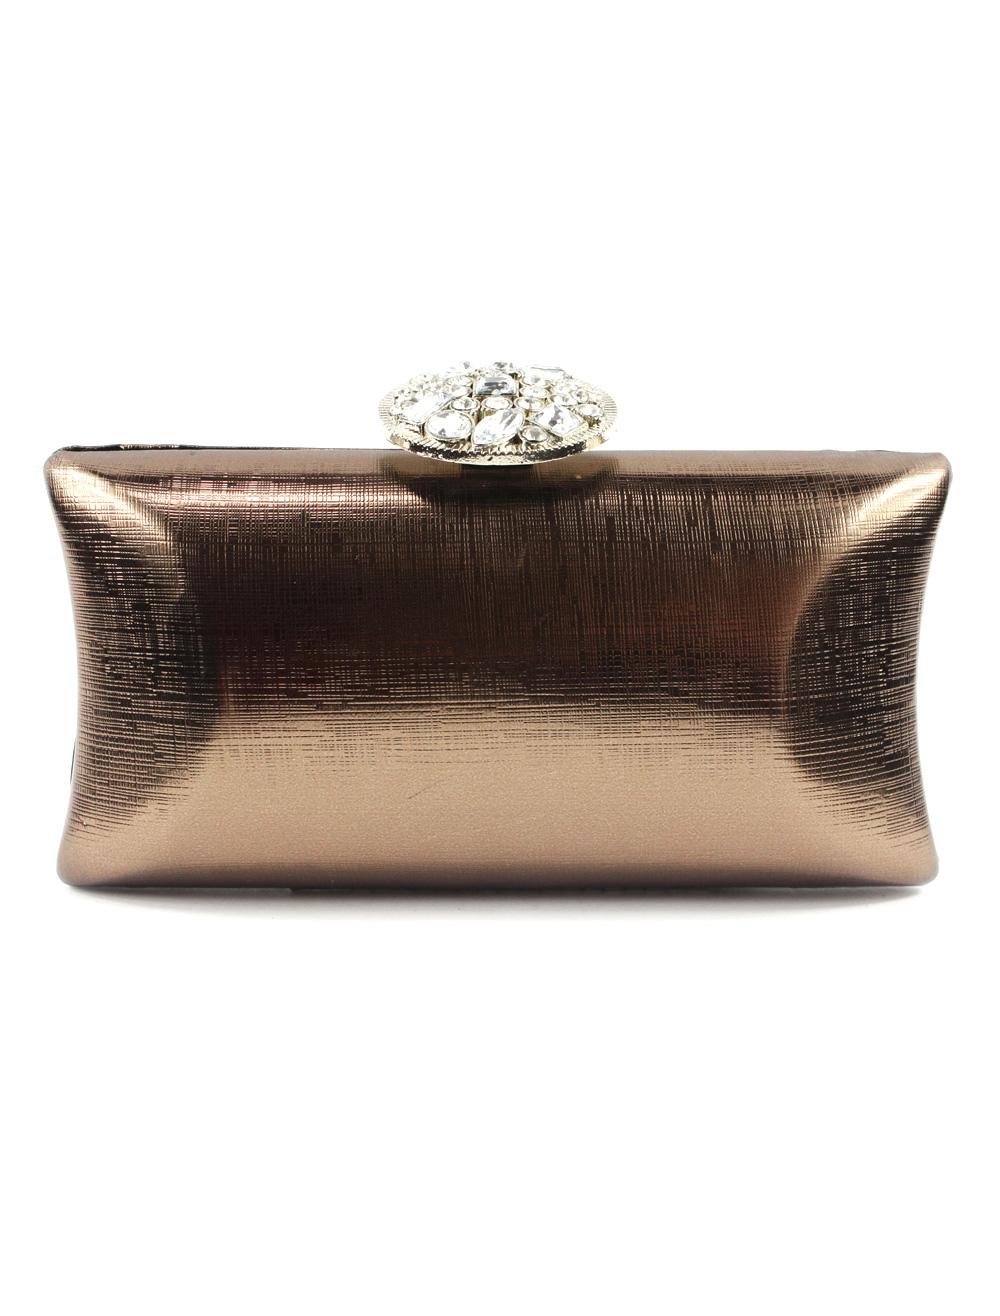 Metallic Evening Bag with Rhinestone Decor